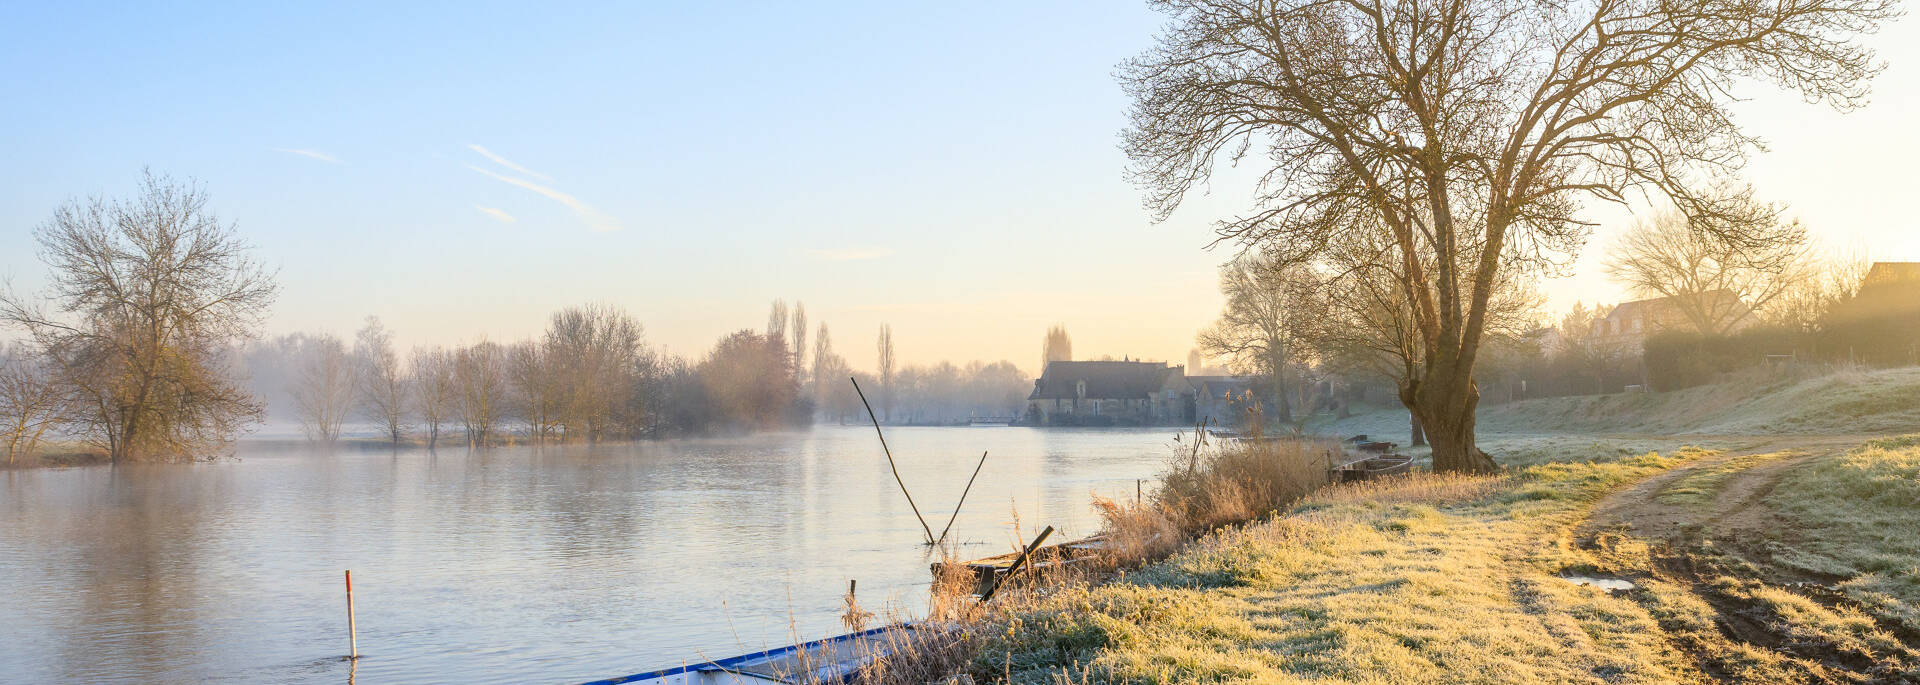 Rives du Loir